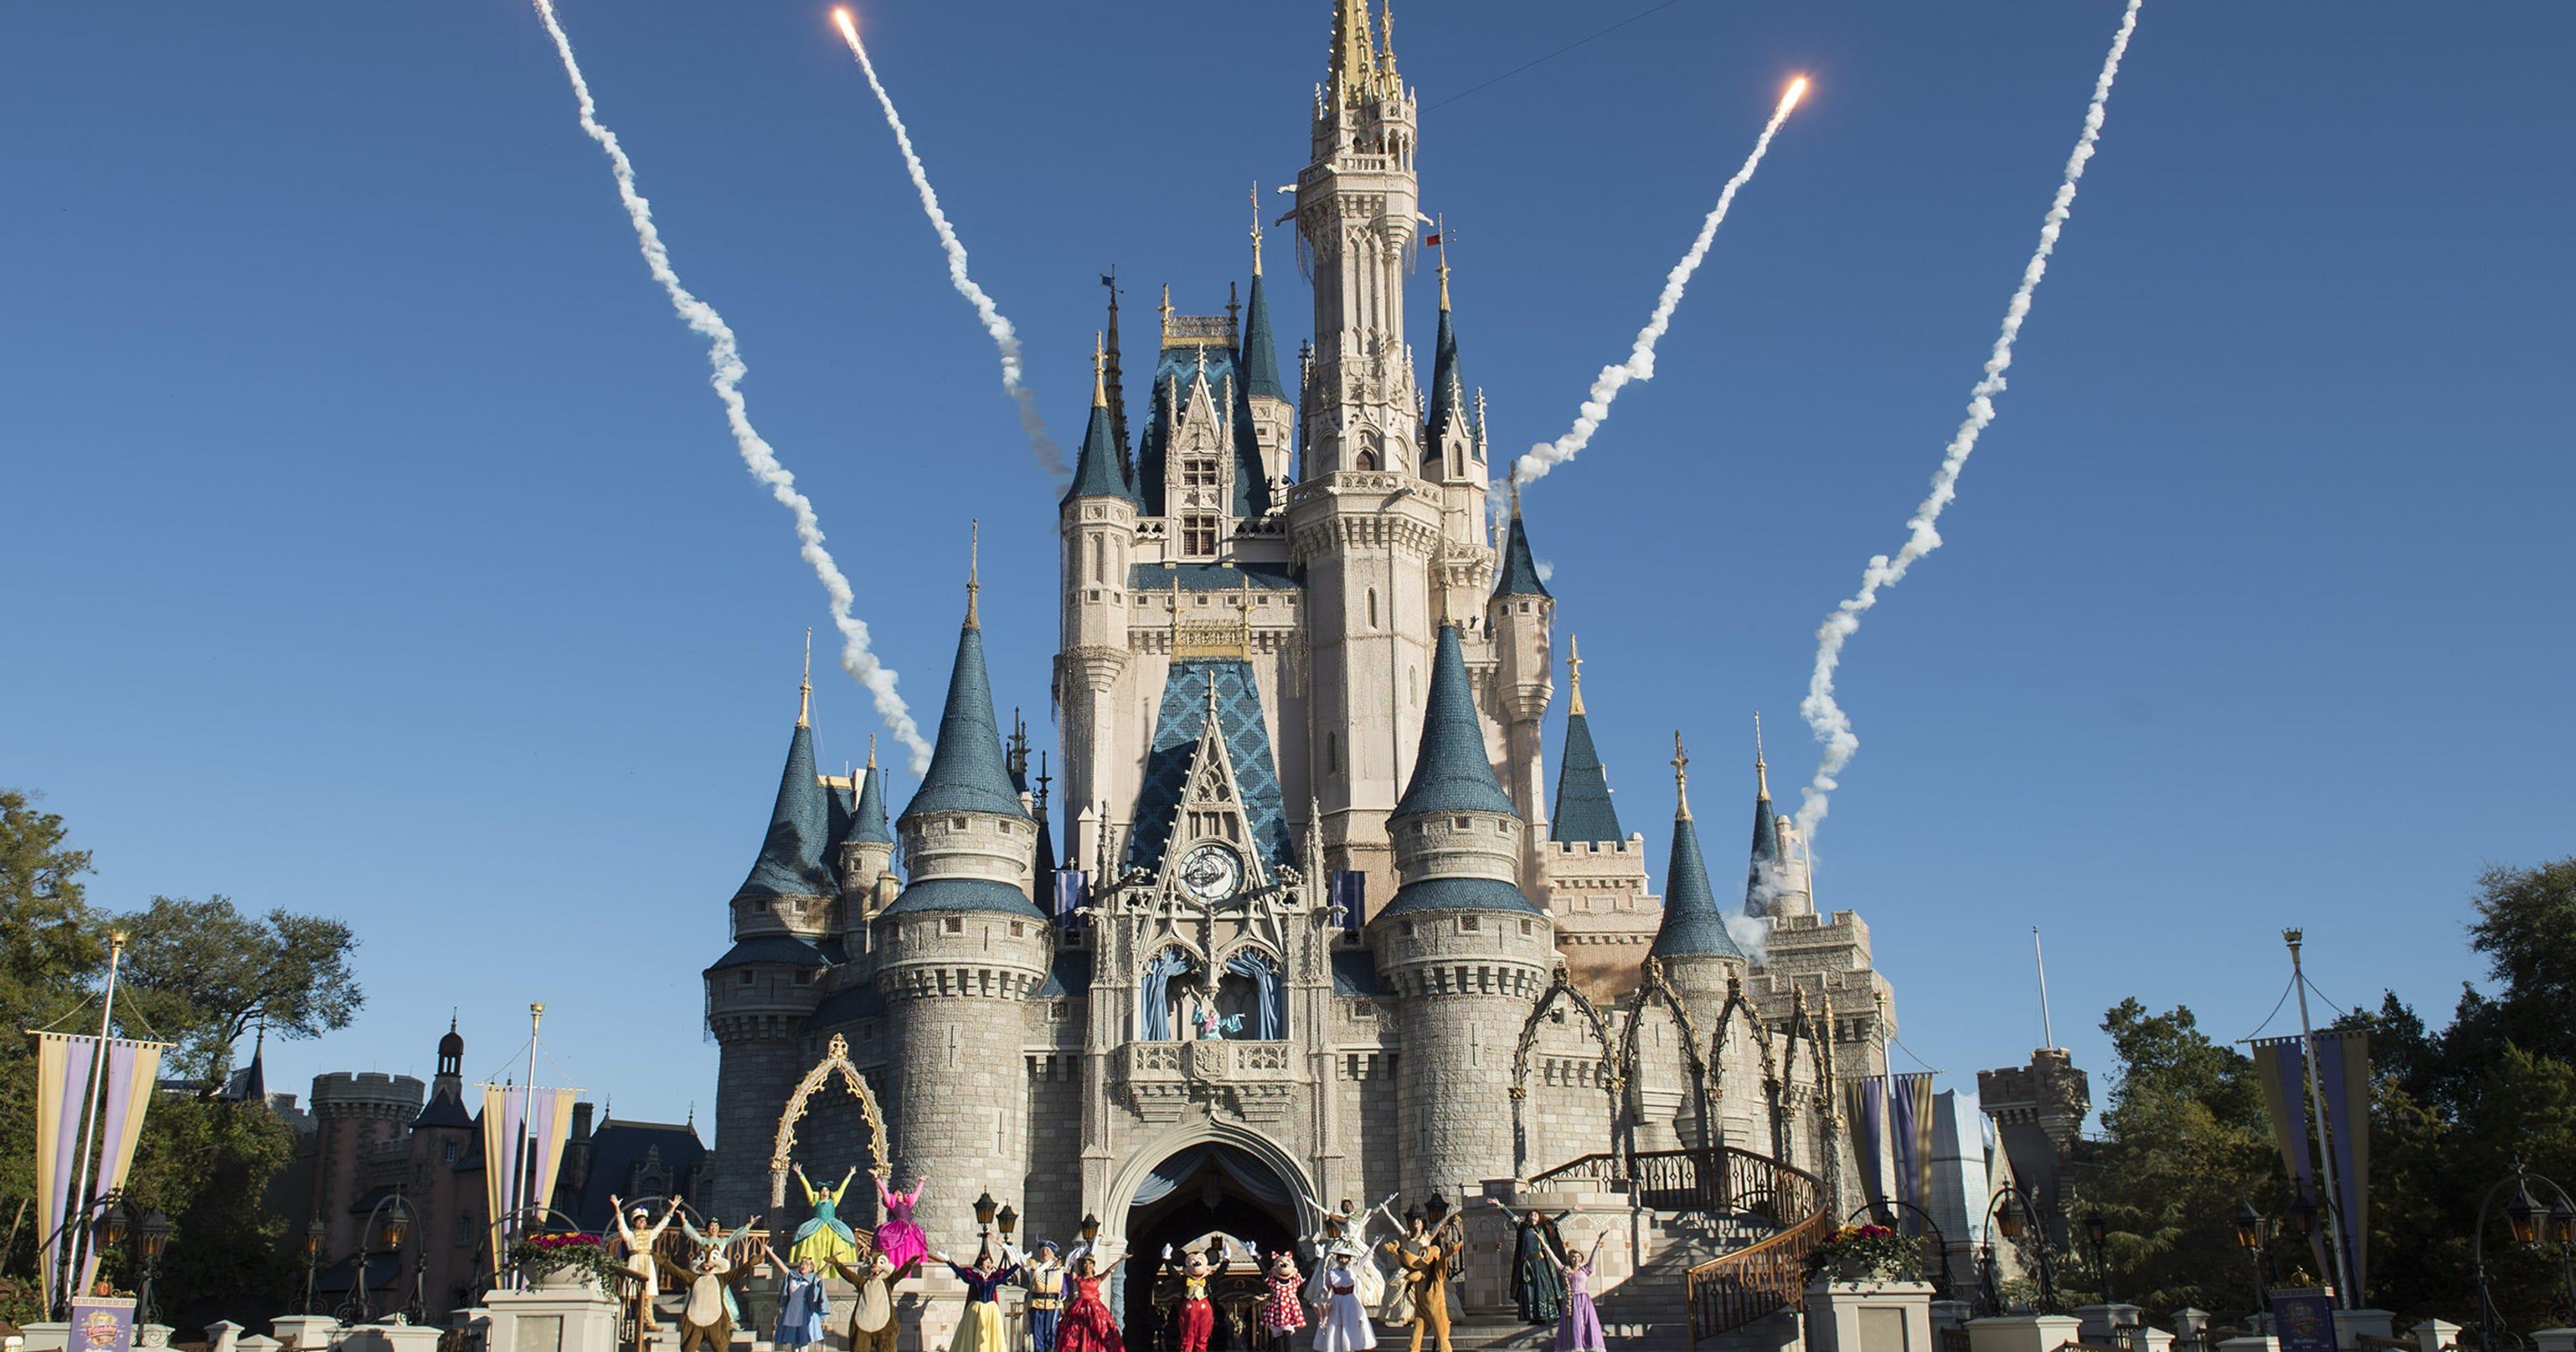 Disney World price increase 2018: Tickets rise for Disney World ...